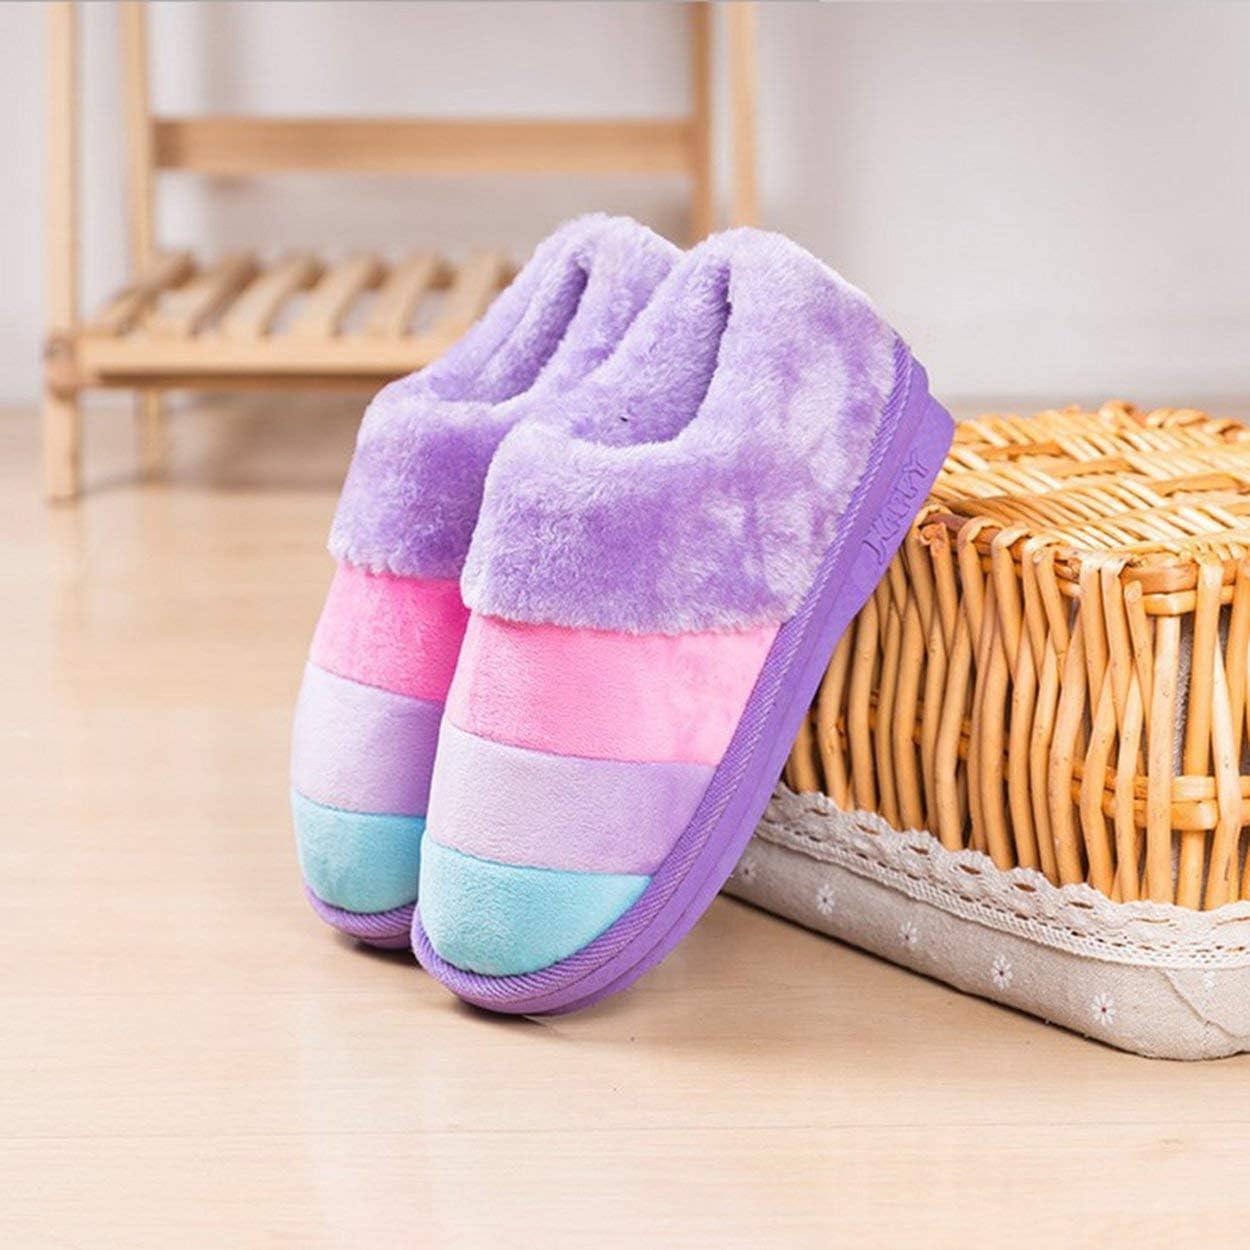 Lamijua Autumn and Winter Color Stripes Pregnant Women Fur Slippers